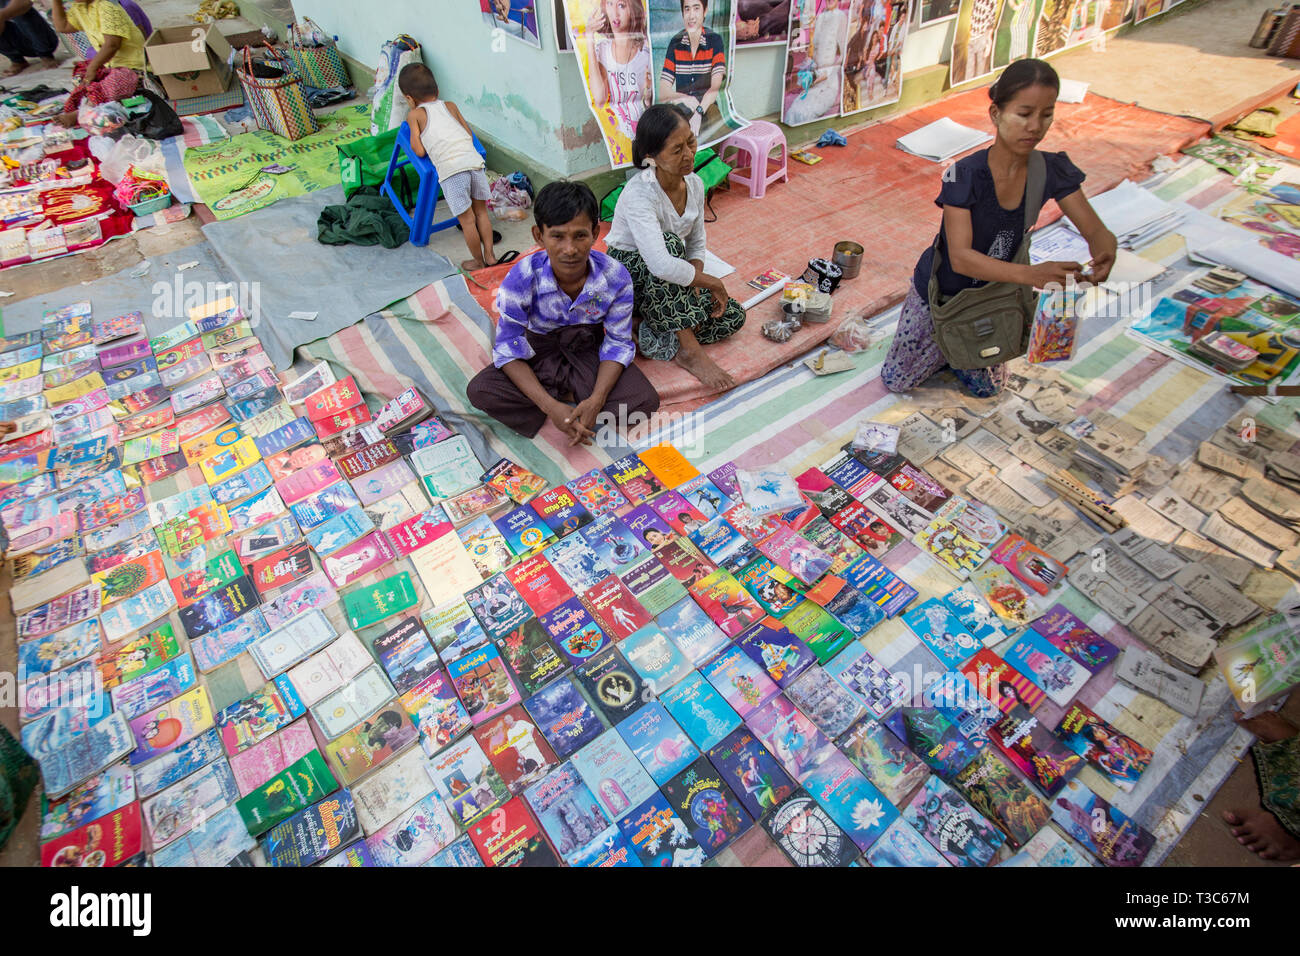 Book seller at the Vesak full moon festival to celebrate the birthday of Lord Buddha at Shwe Yin Maw Pagoda, near Thazi, Myanmar (Burma). - Stock Image